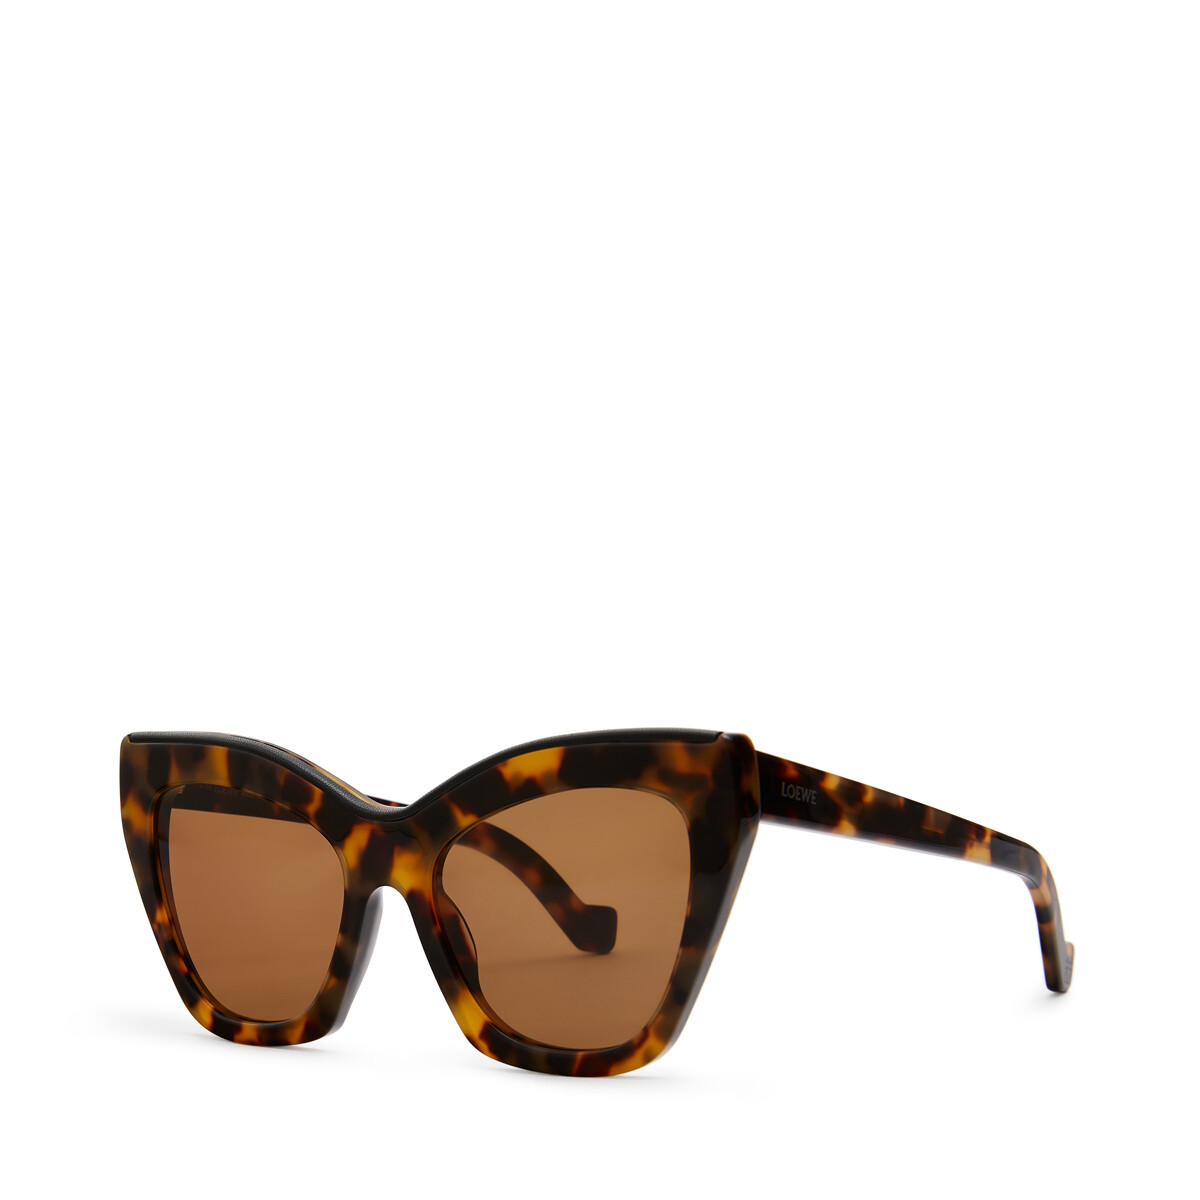 LOEWE Cateye Sunglasses Tokyo Havana/Black/V Br front